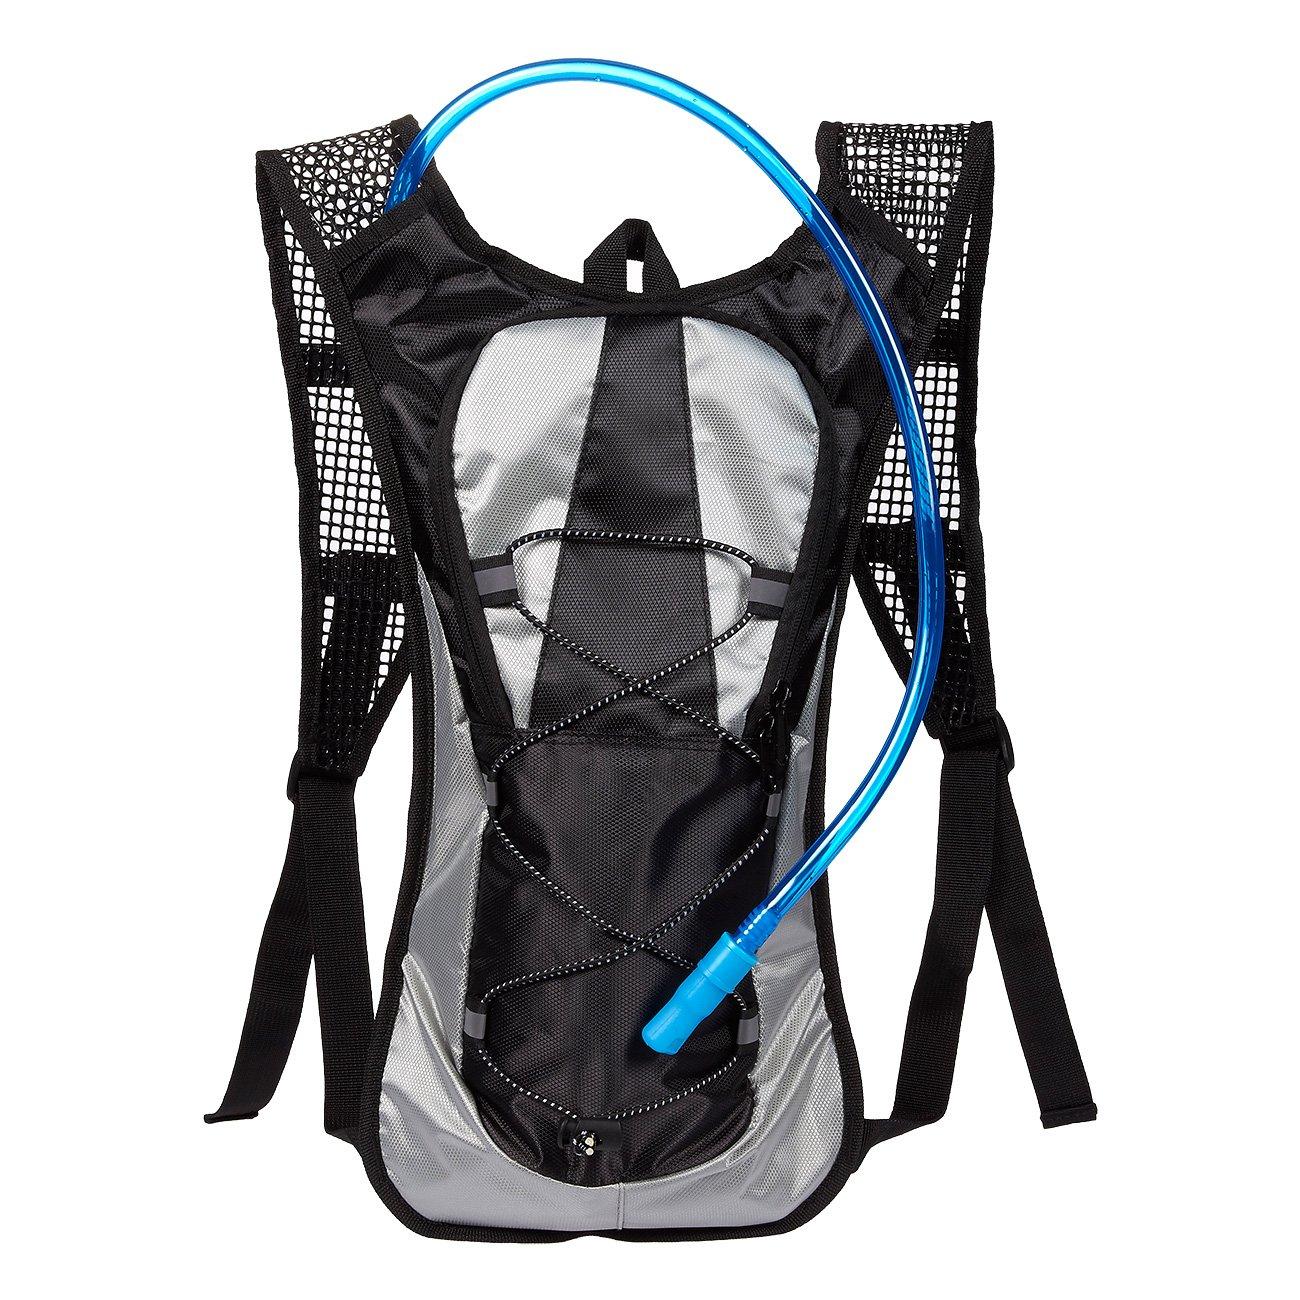 Juvale Mochila de hidratació n con Bolsa de Agua de 2 litros, Ideal para Ciclismo, Senderismo, Correr, Ciclismo, Todas Las Actividades al Aire Libre, Color Gris